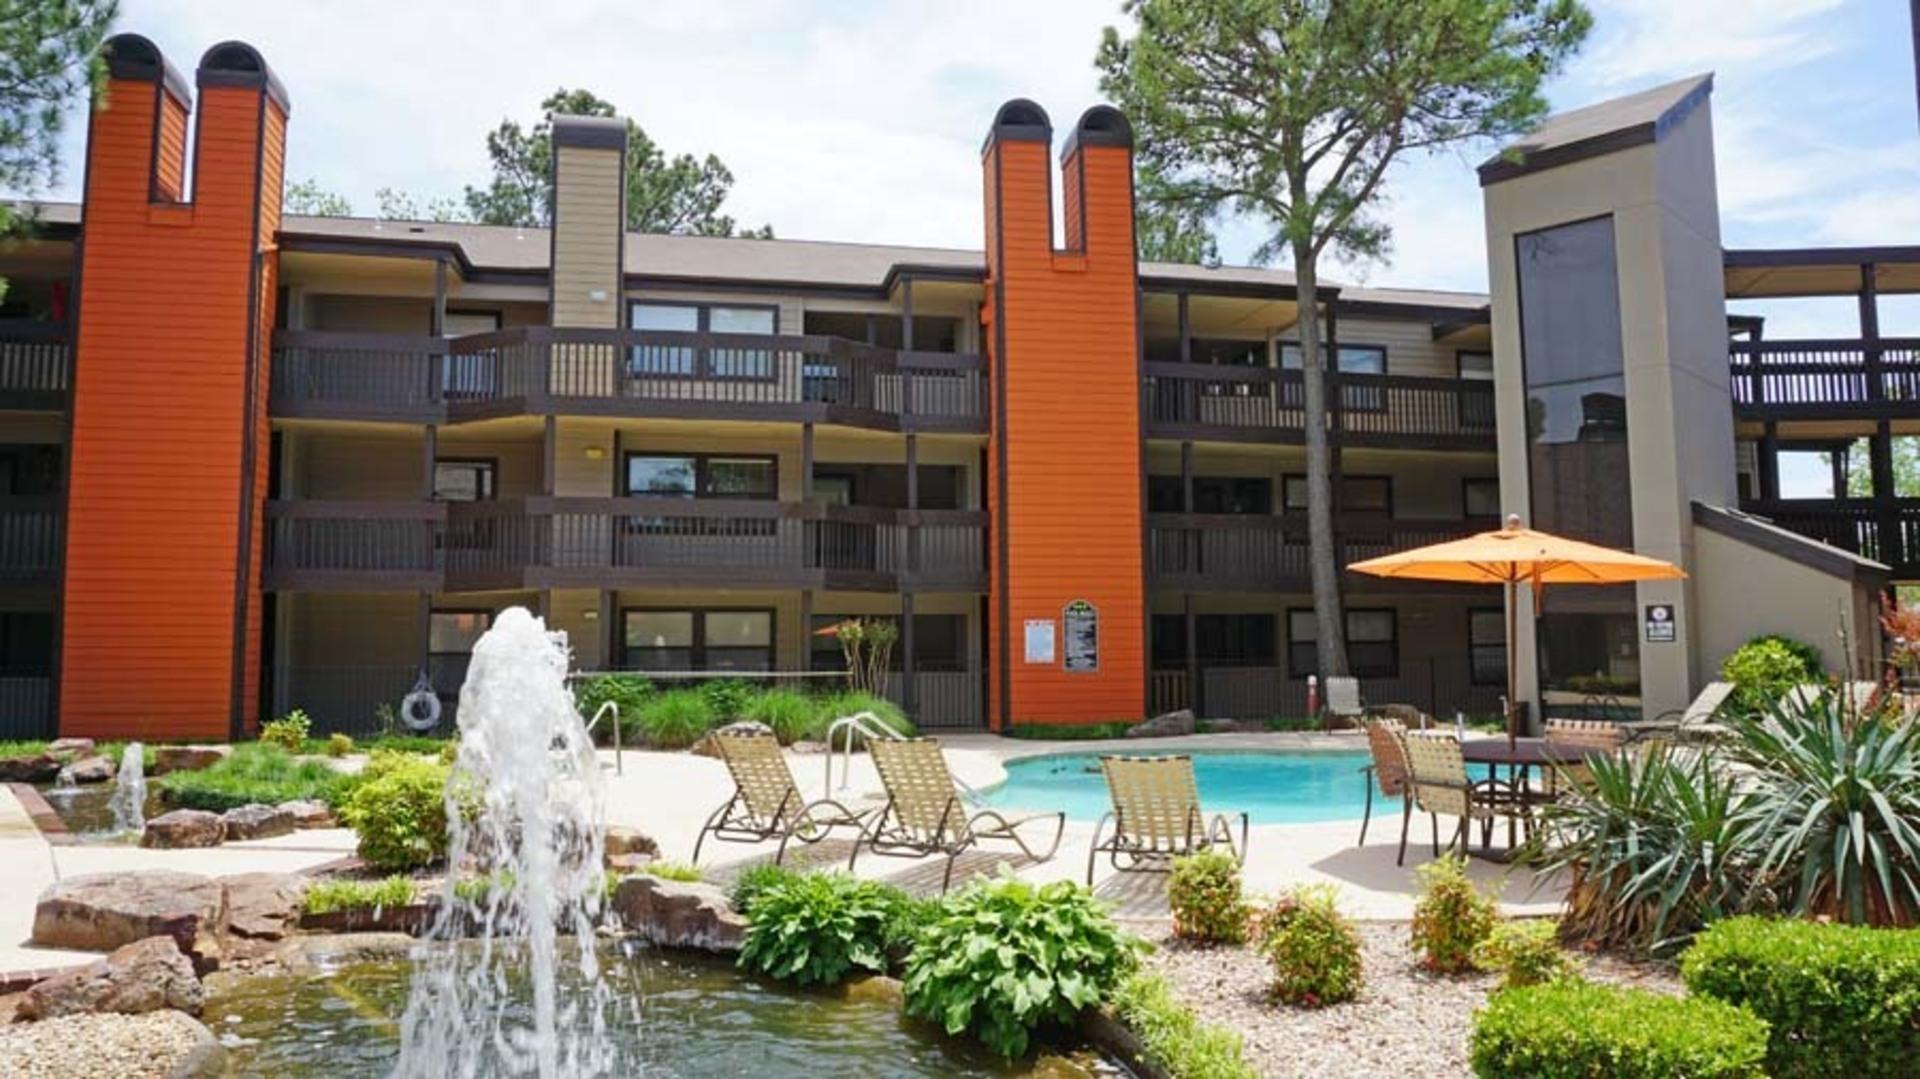 Waterside Apartments Tulsa Login